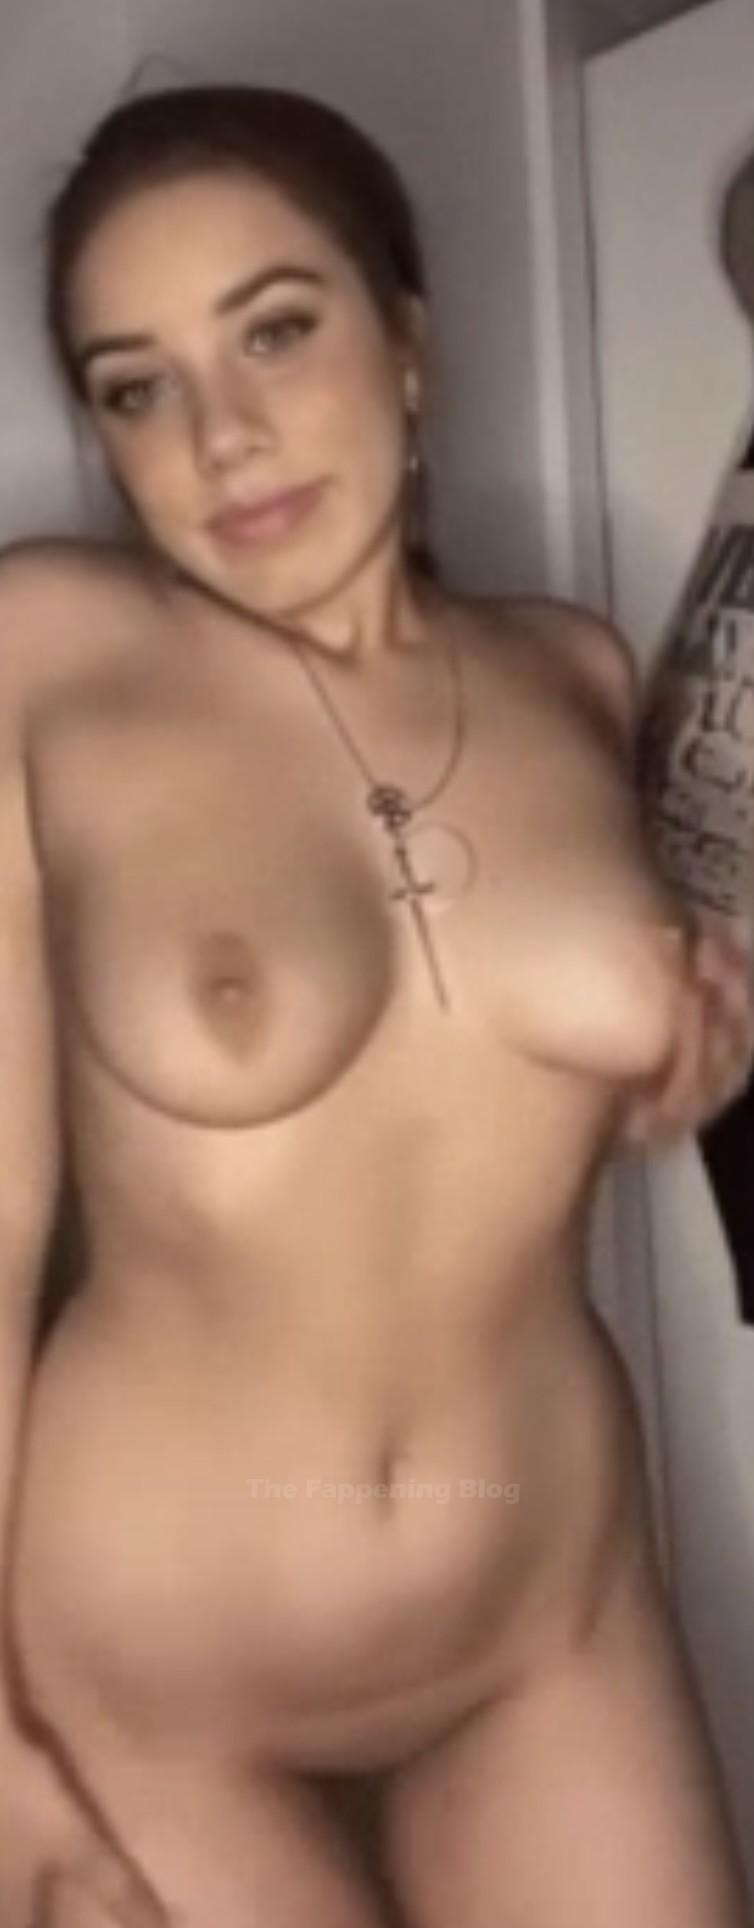 Belen Sisa Nude Leaked The Fappening (2 Photos)